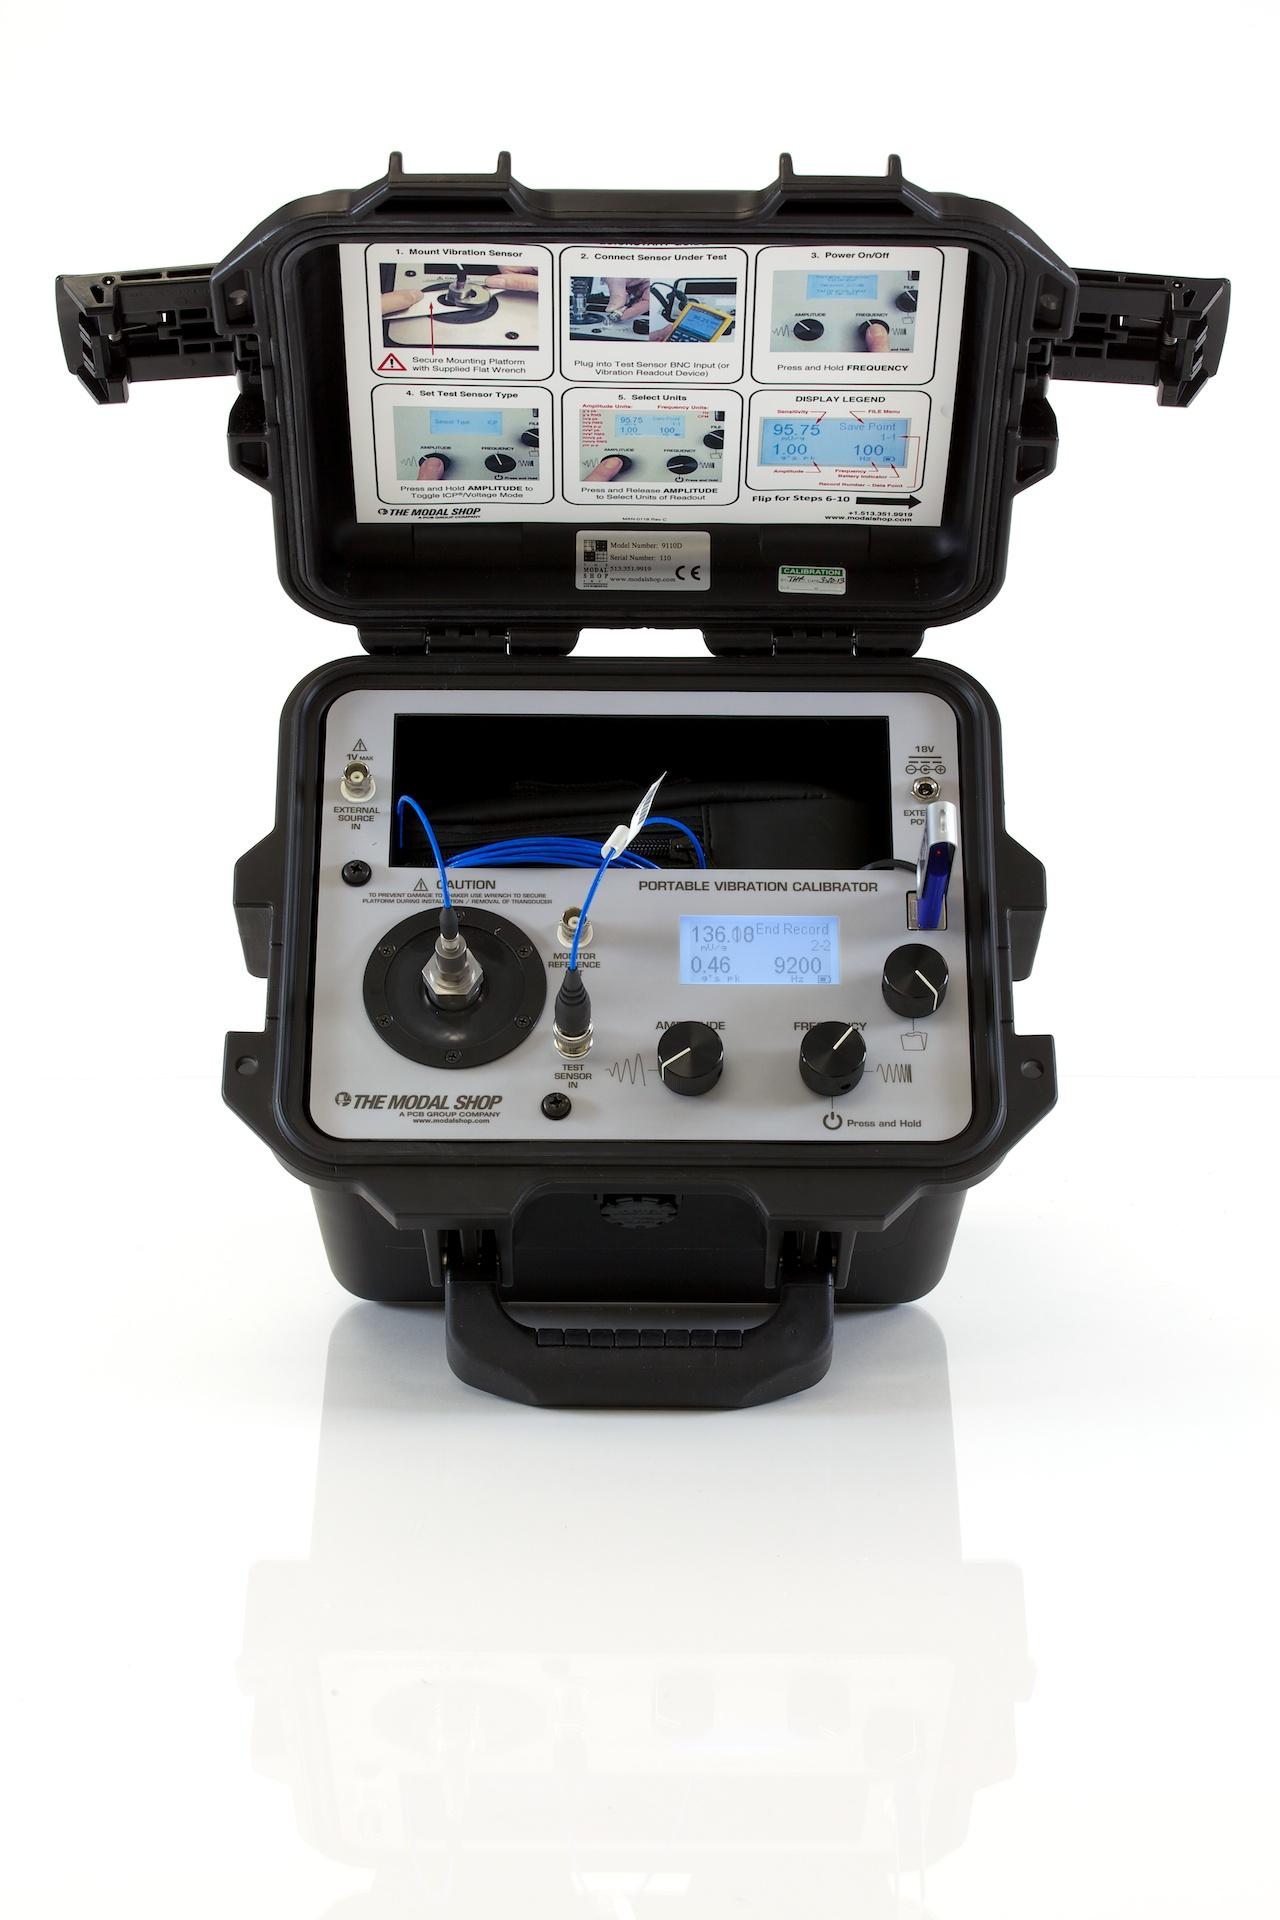 https://kaitrade.cz/media/aktuality/produktove-prispevky/pvc/9110d-portable-vibration-calibrator-img-0129-lr.jpg